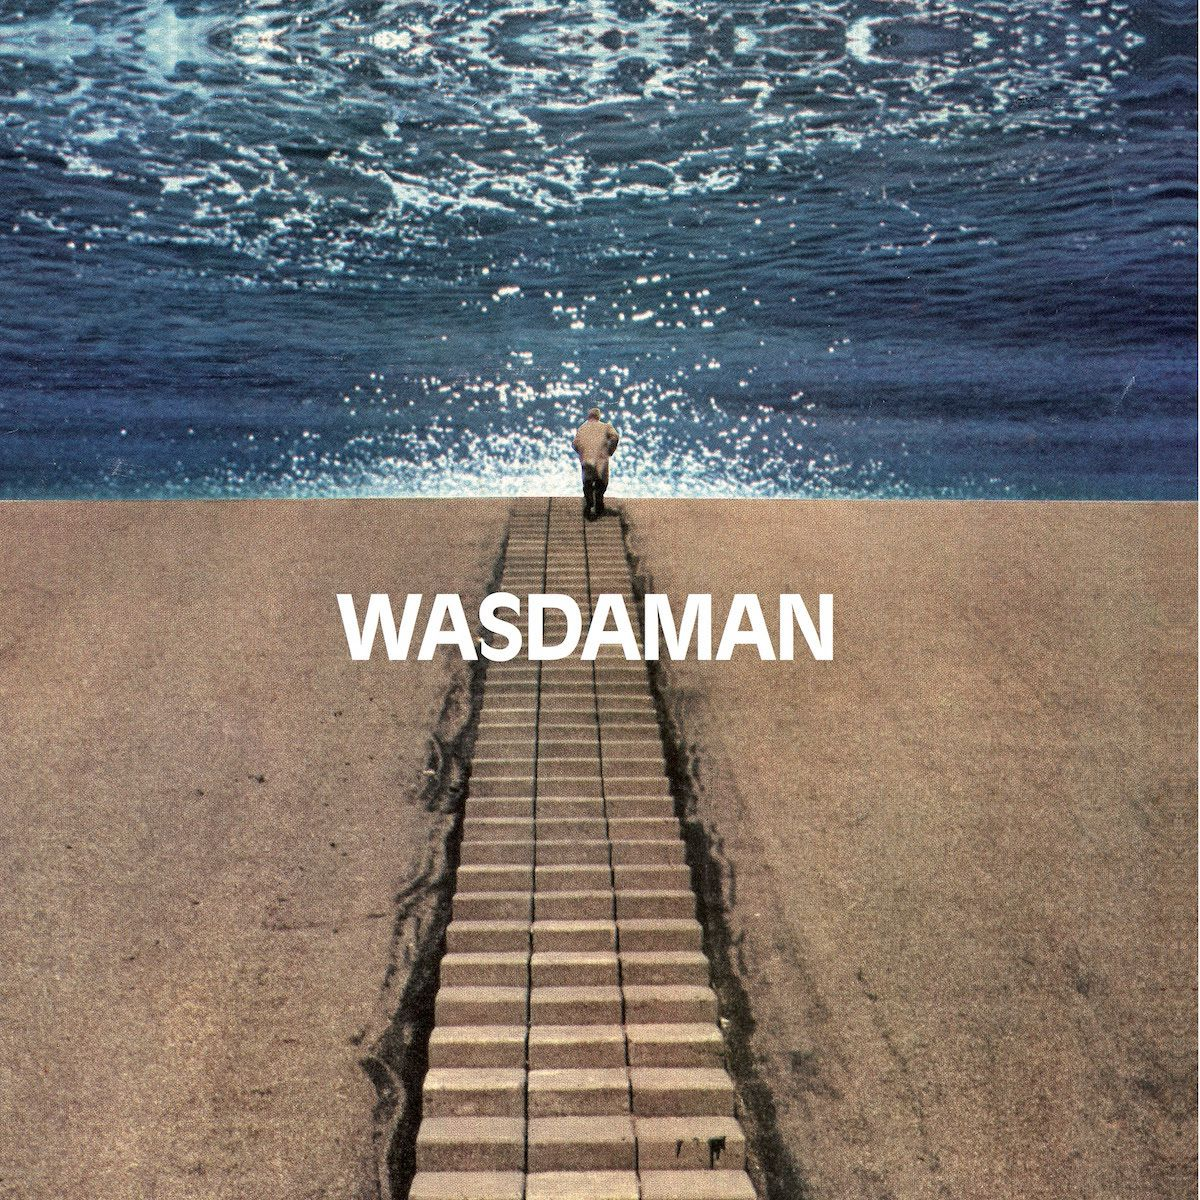 Wasdaman